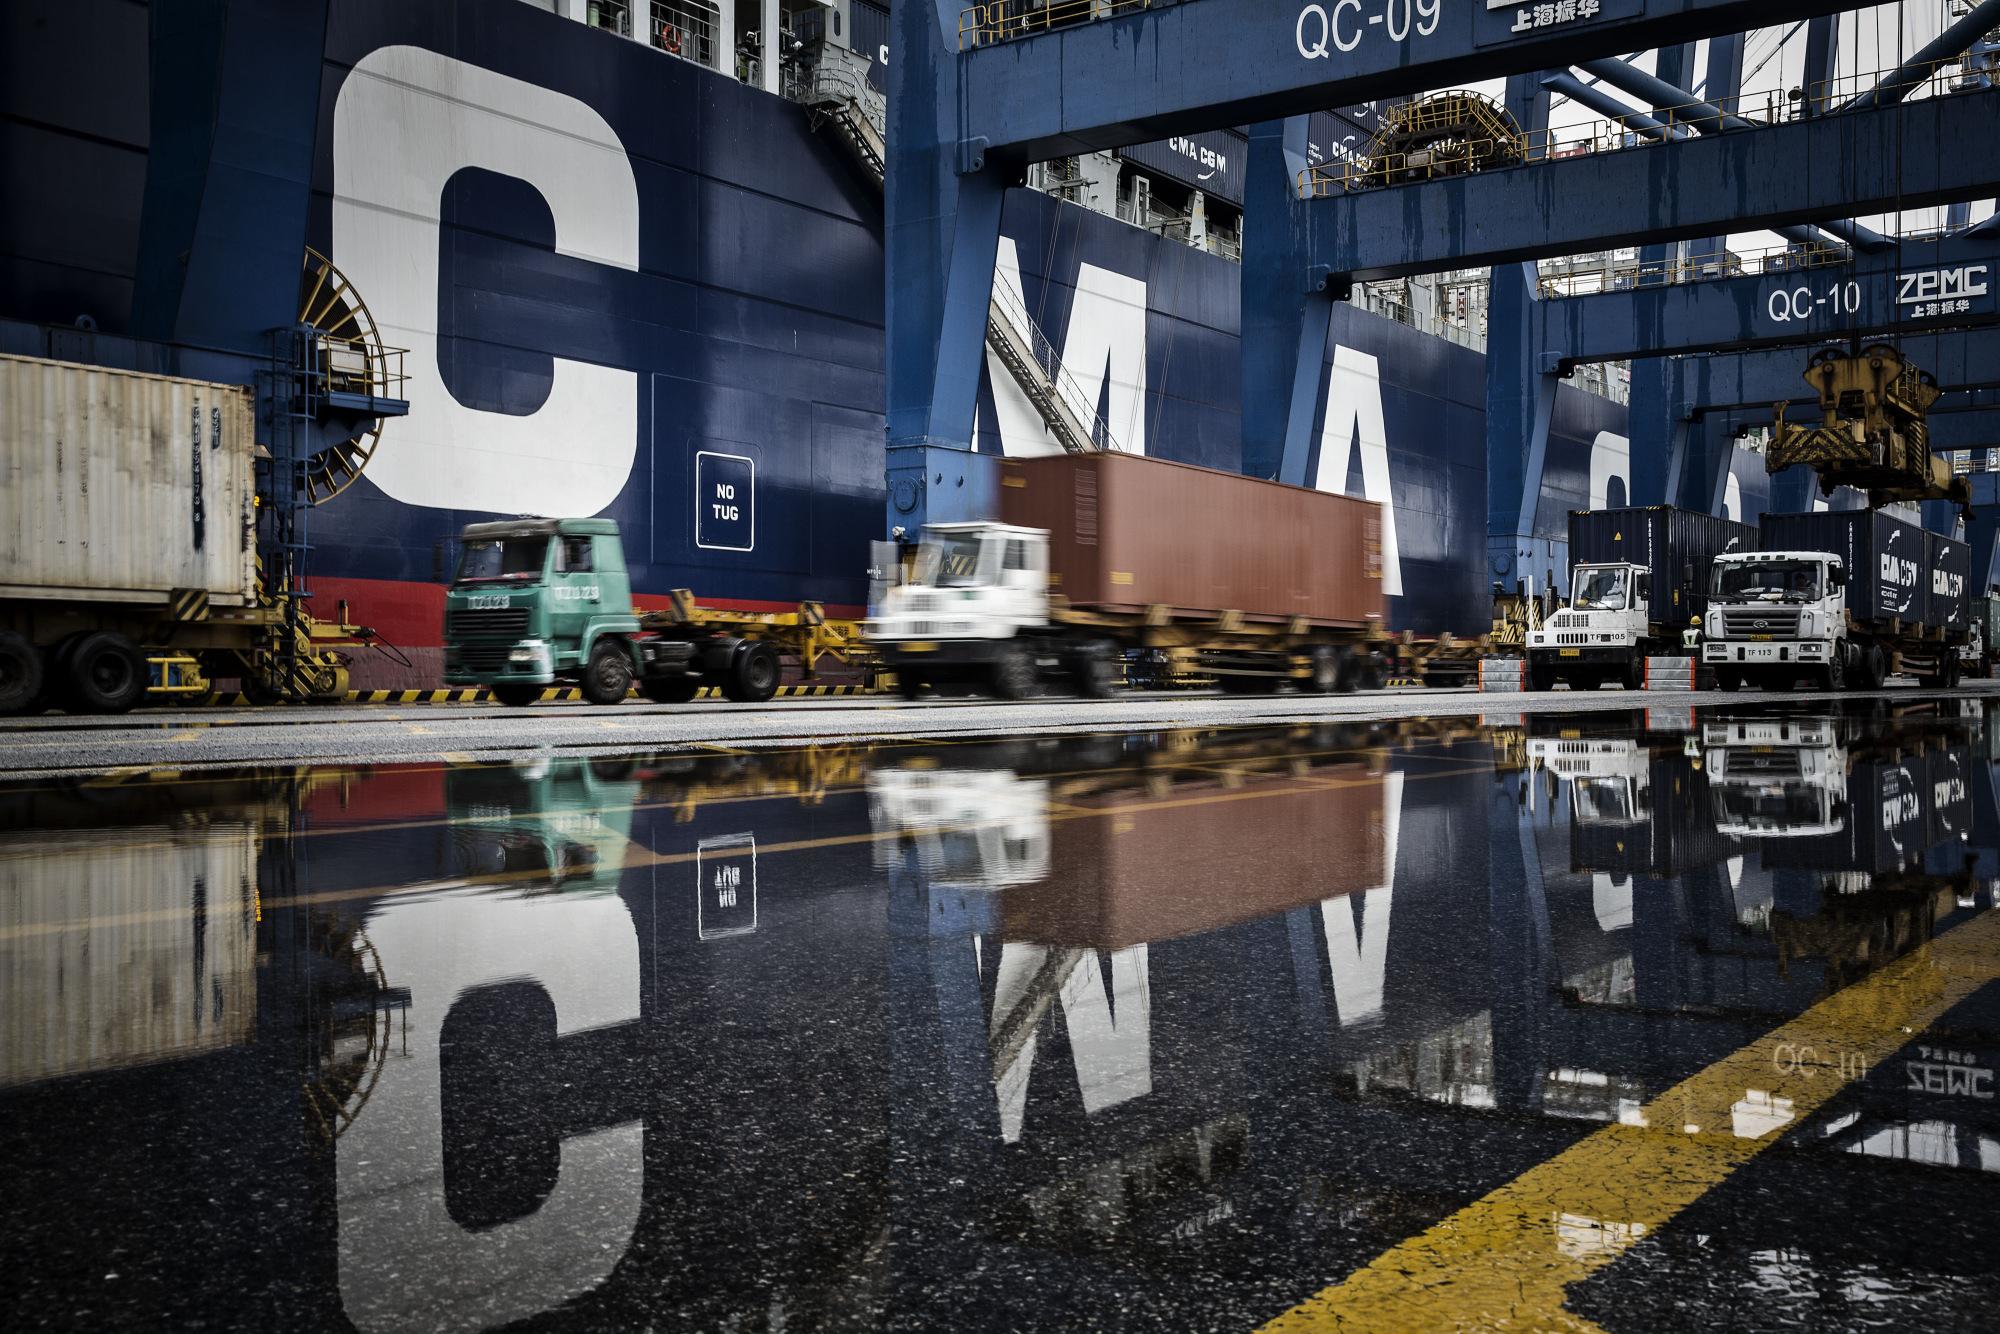 bloomberg.com - U.S. China Trade War: Analysis of Latest Developments